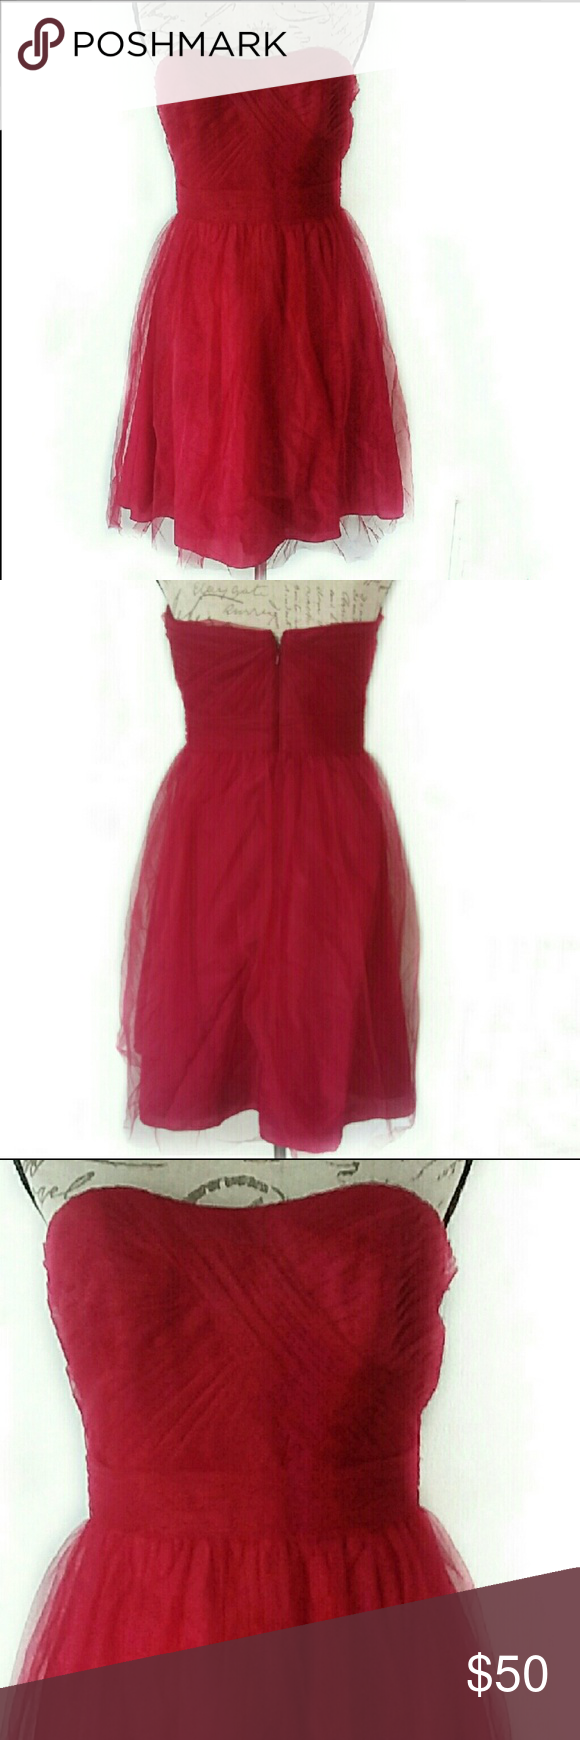 Short prom dress david bridal dark red size my posh picks